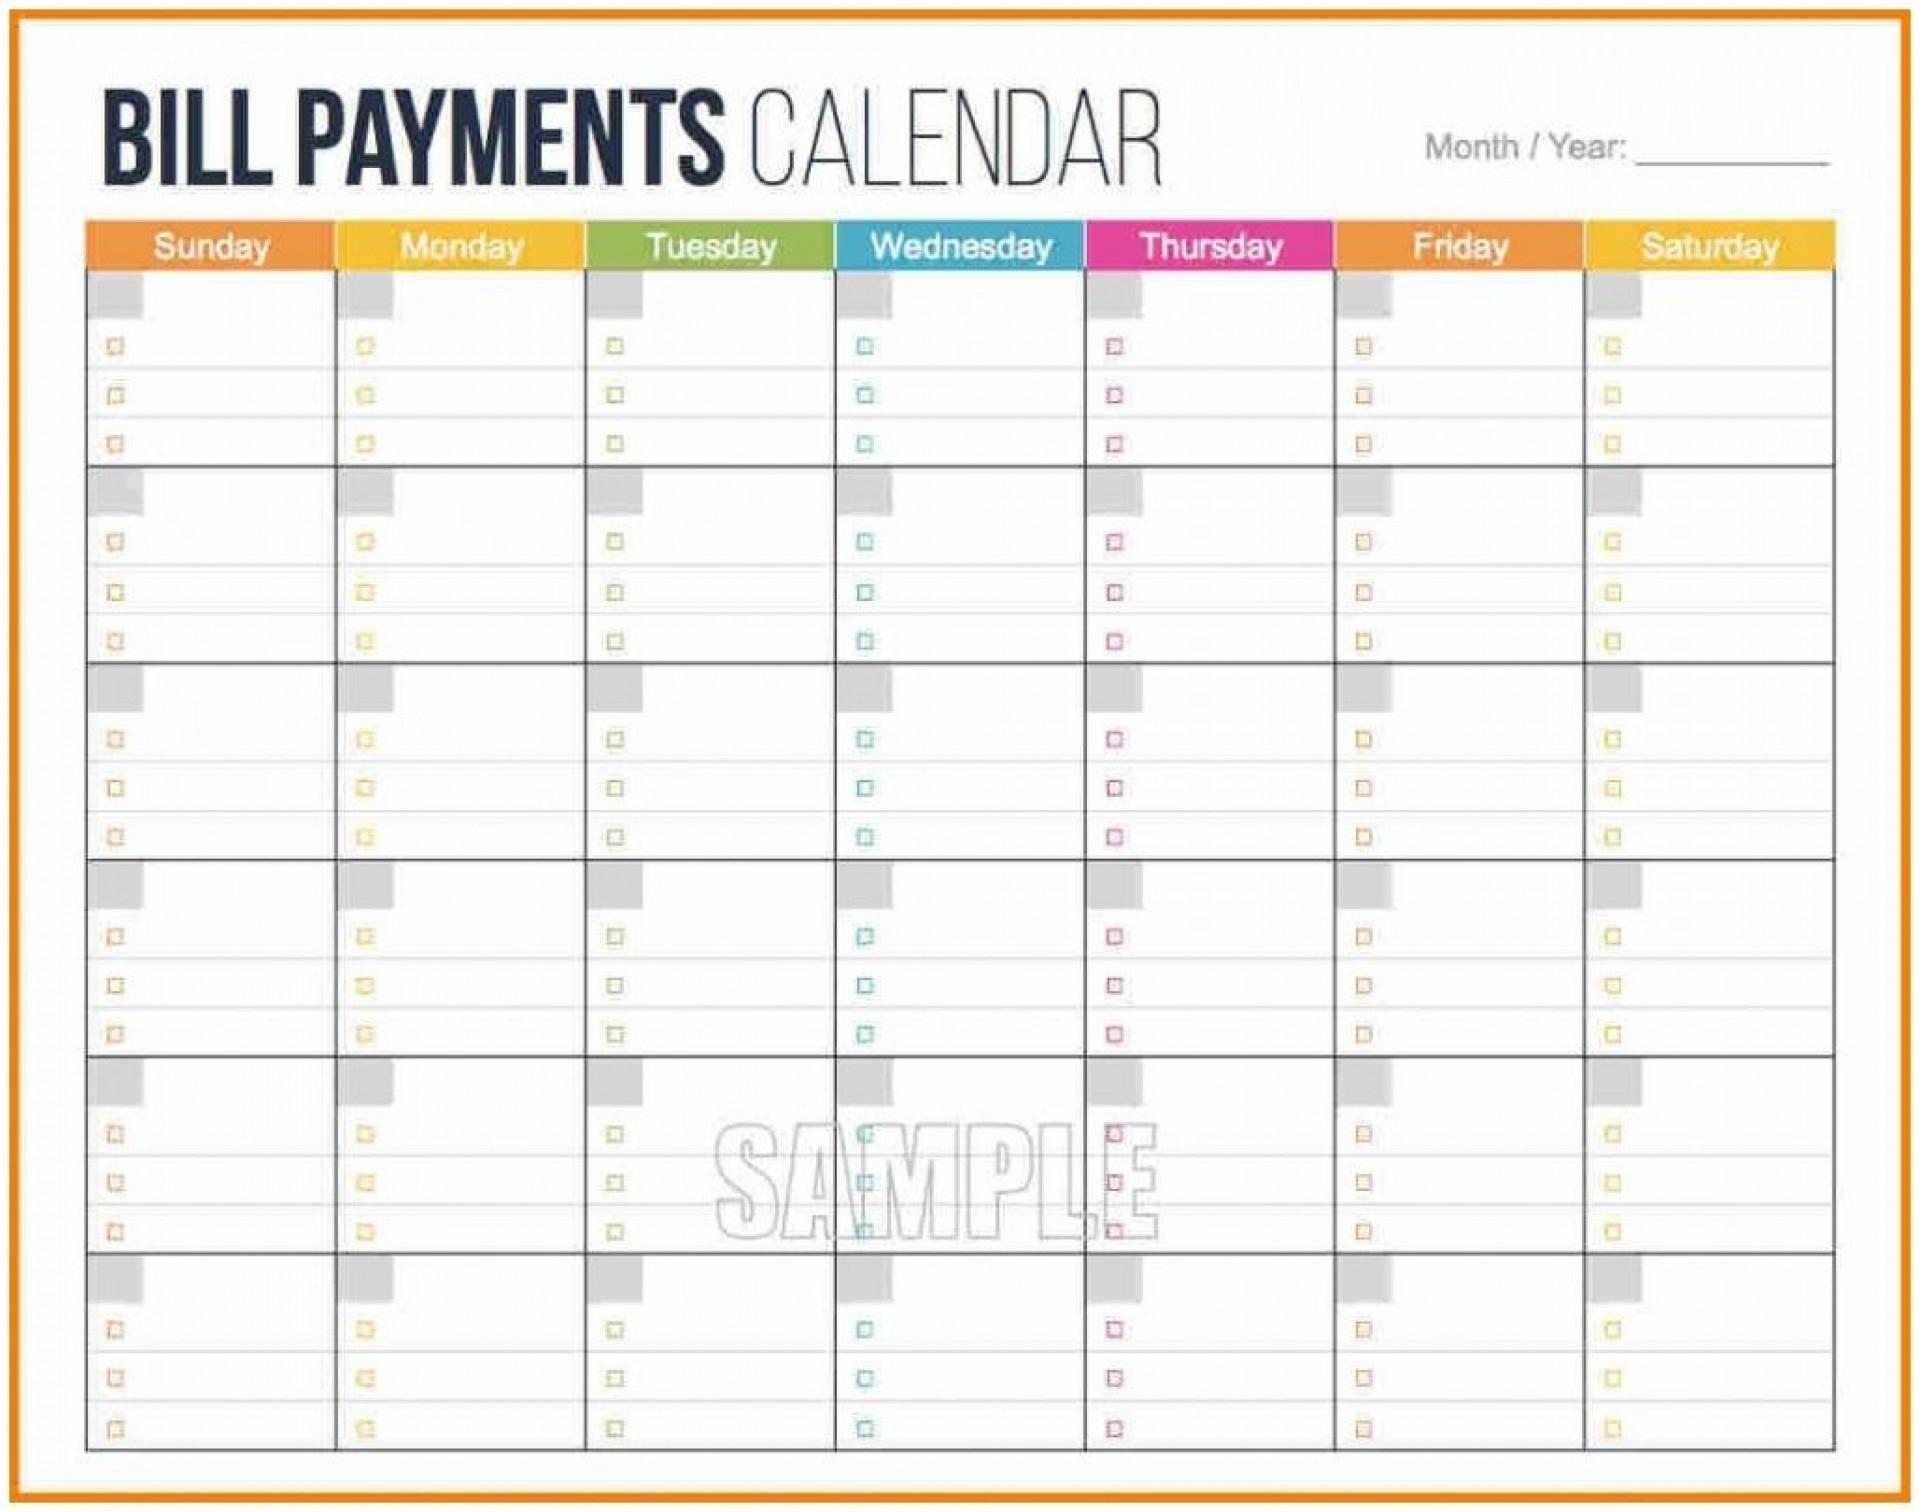 003 Bill Pay Calendar Template Ideas Paying Free Printable with Printable Bill Calendar